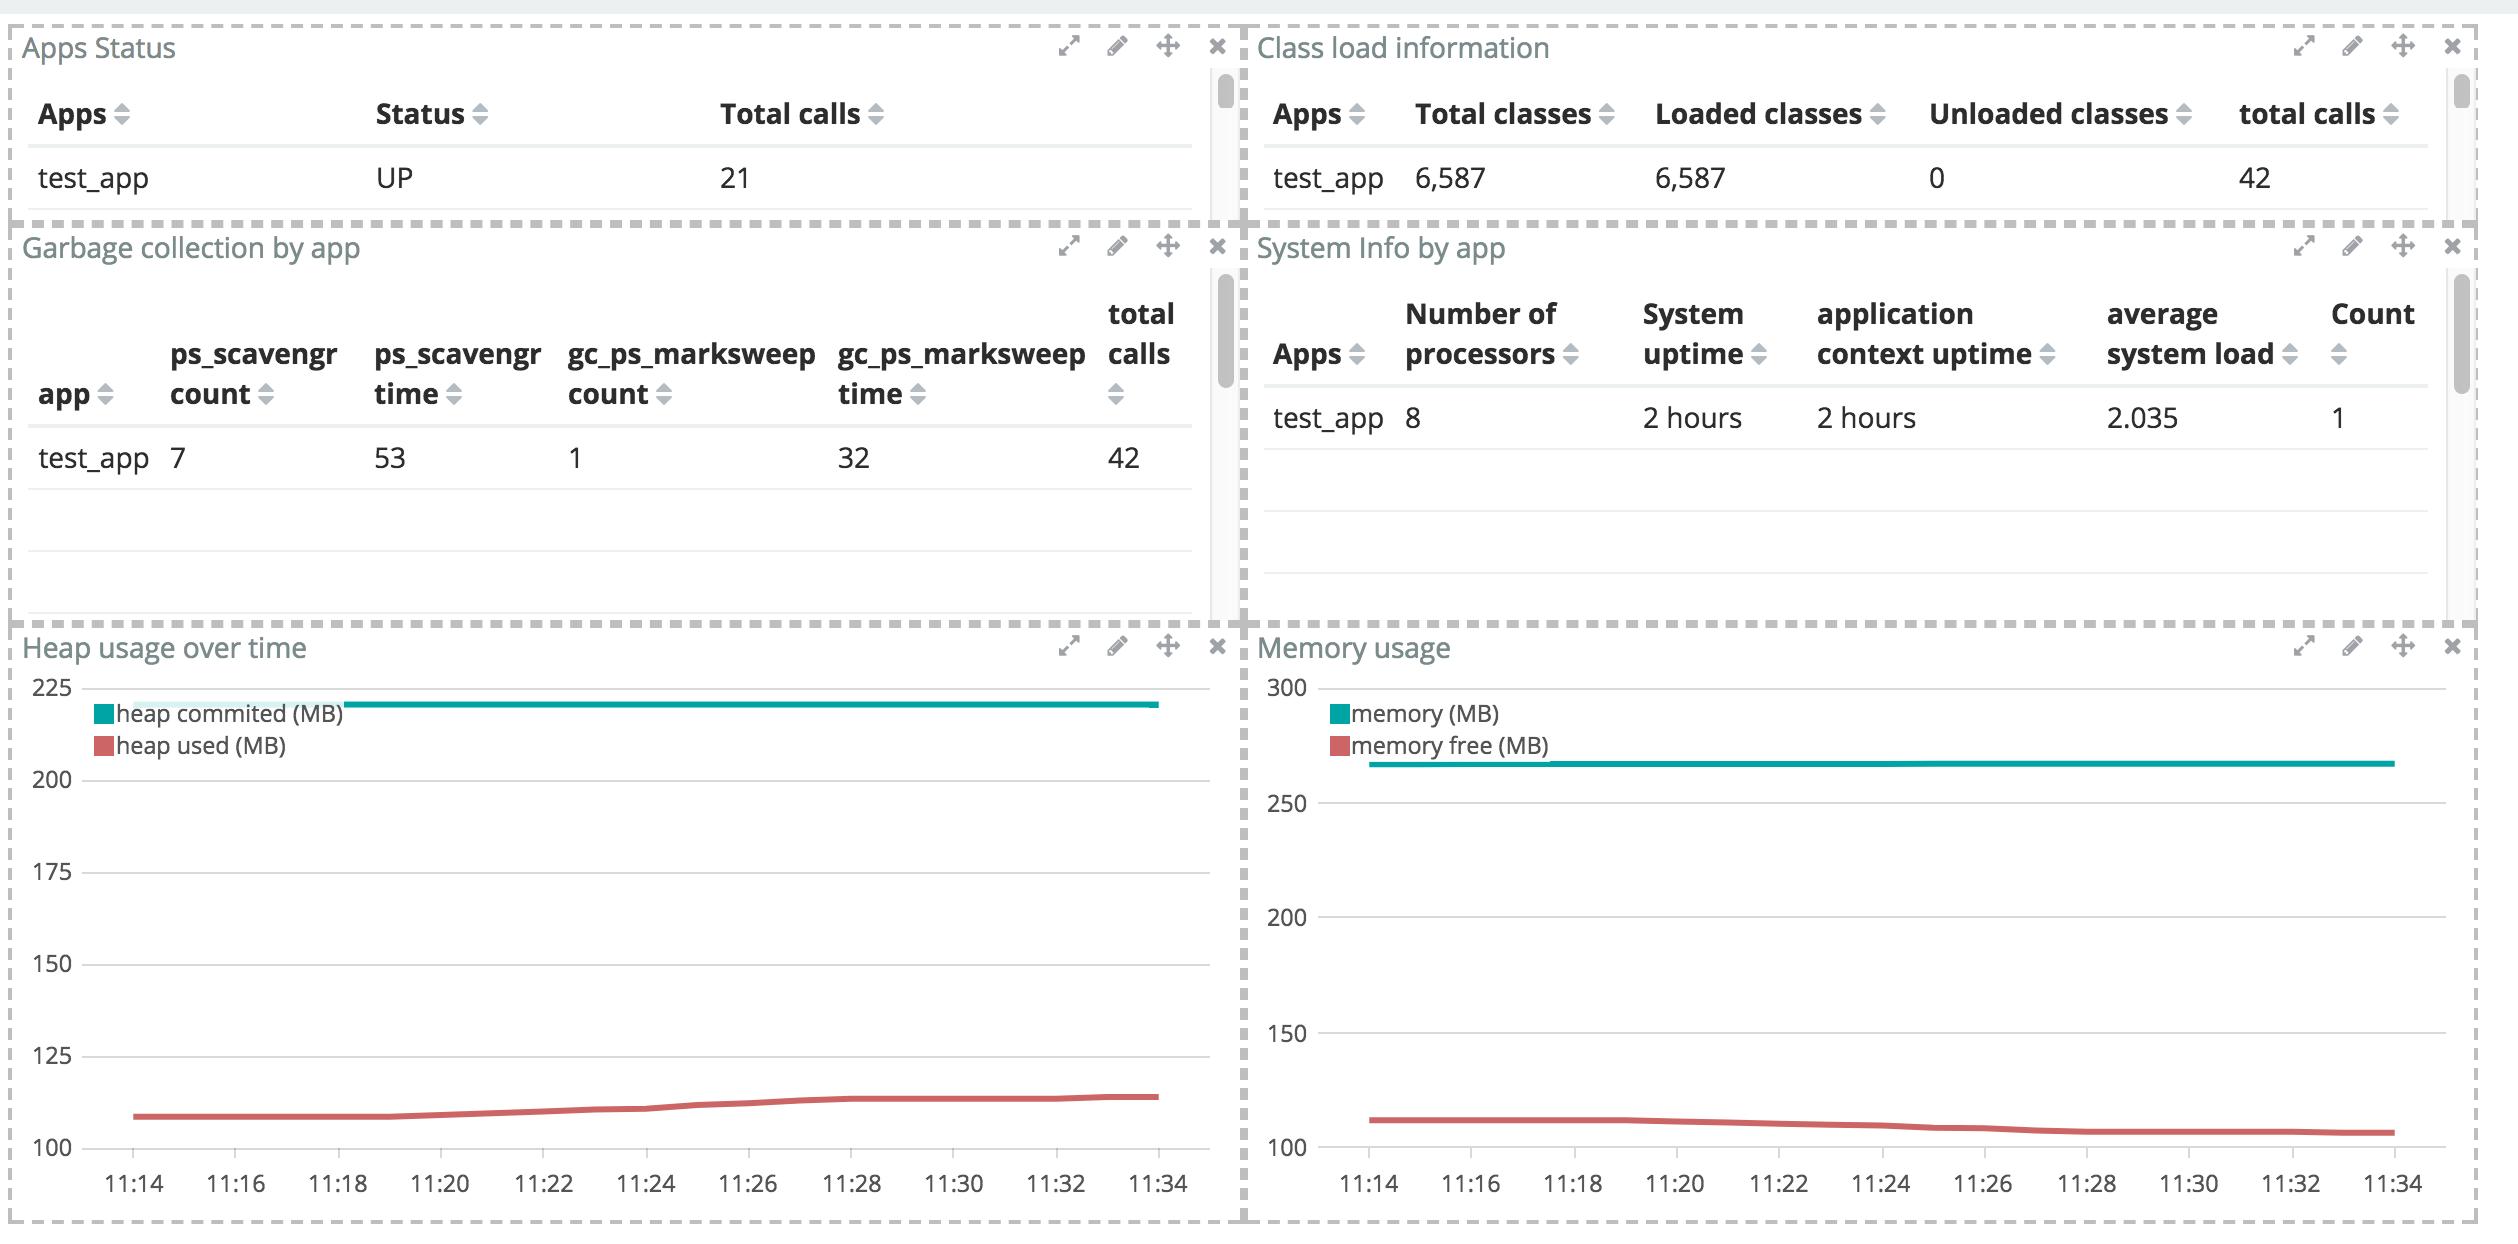 Spring Boot metrics monitoring using elasticsearch and kibana